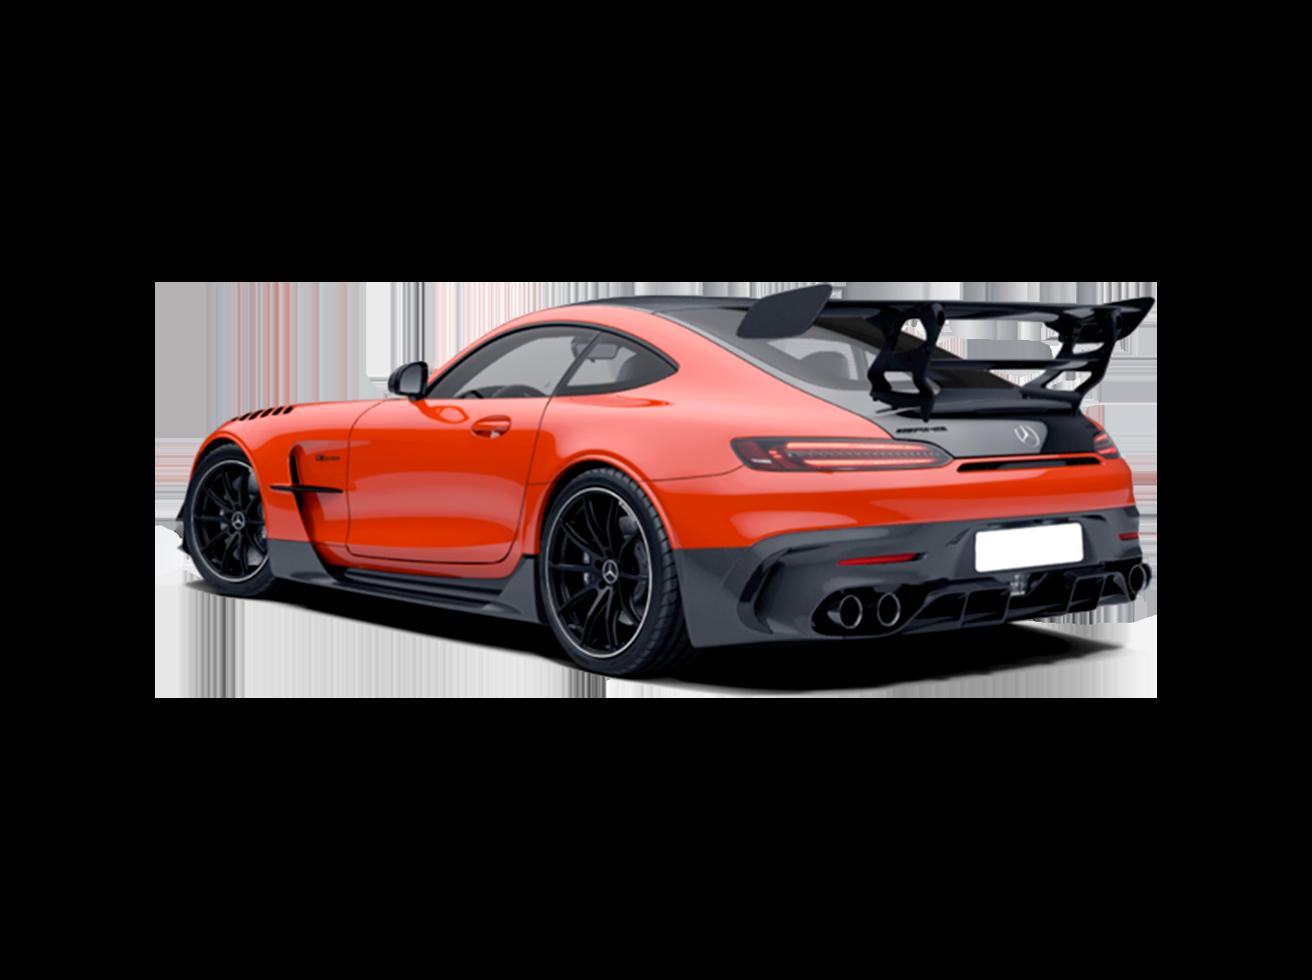 4.0 V8 TURBO GASOLINA BLACK SERIES 7G-DCT